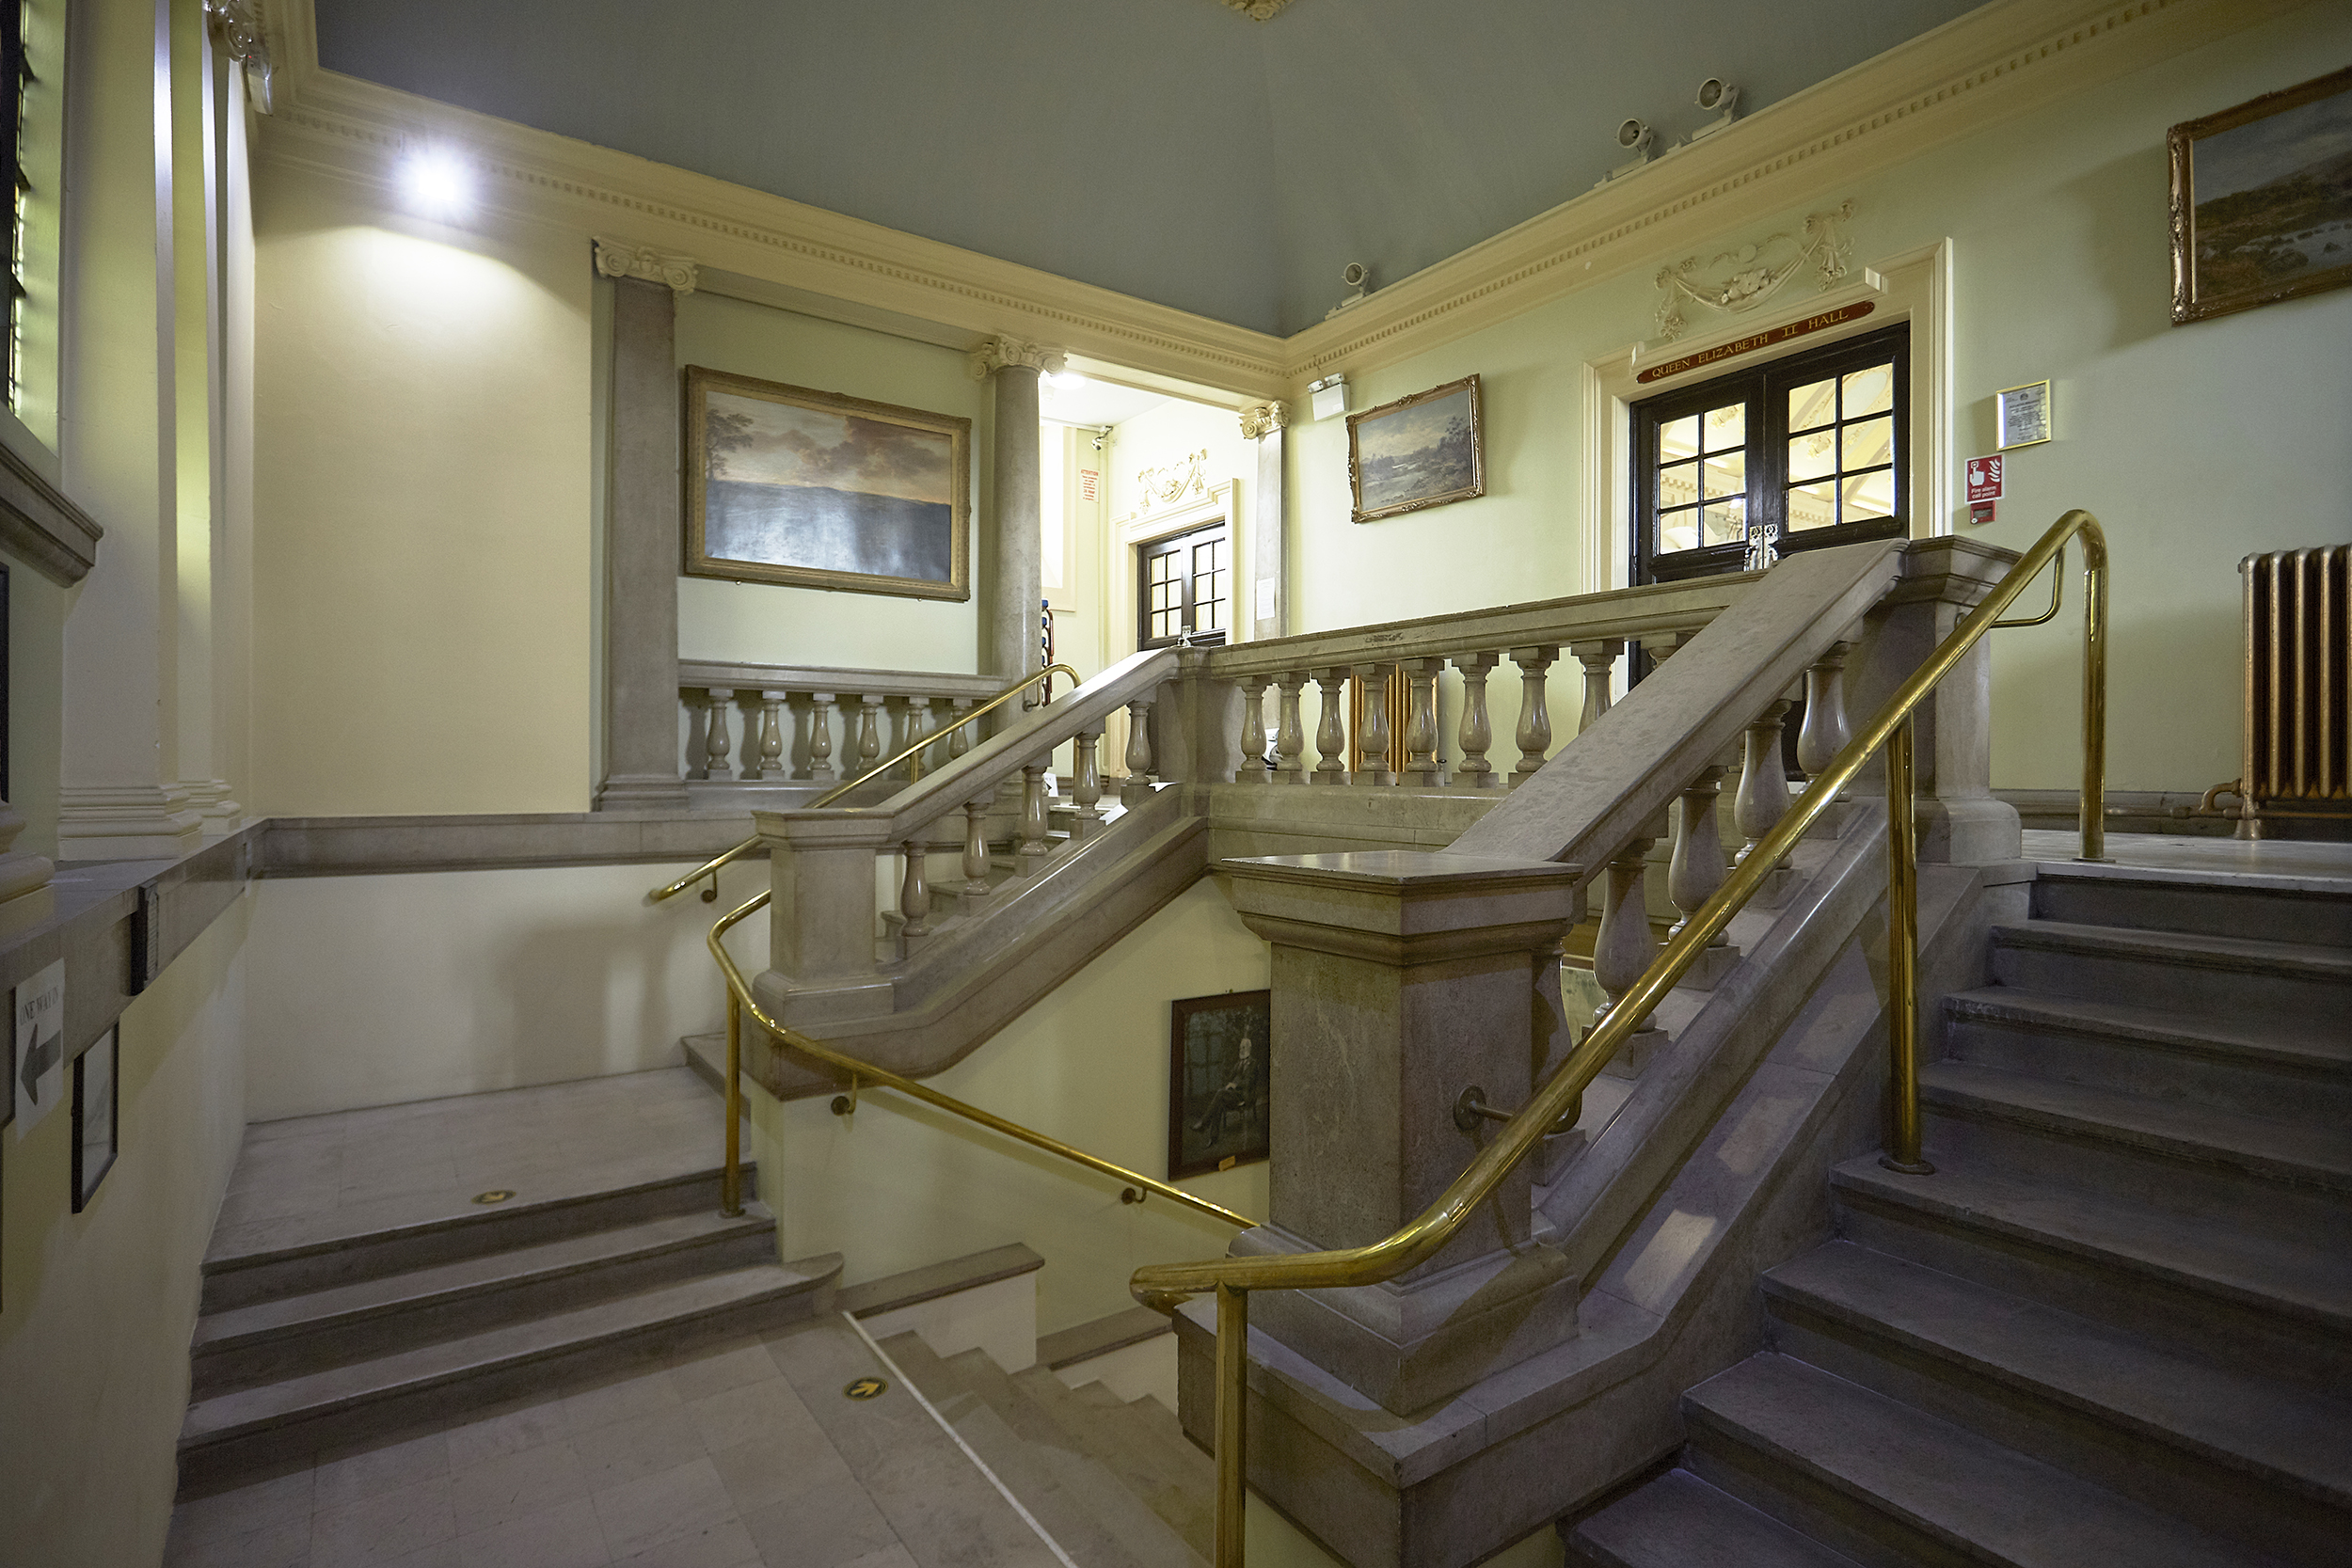 Henley Town Council - Town hall interior